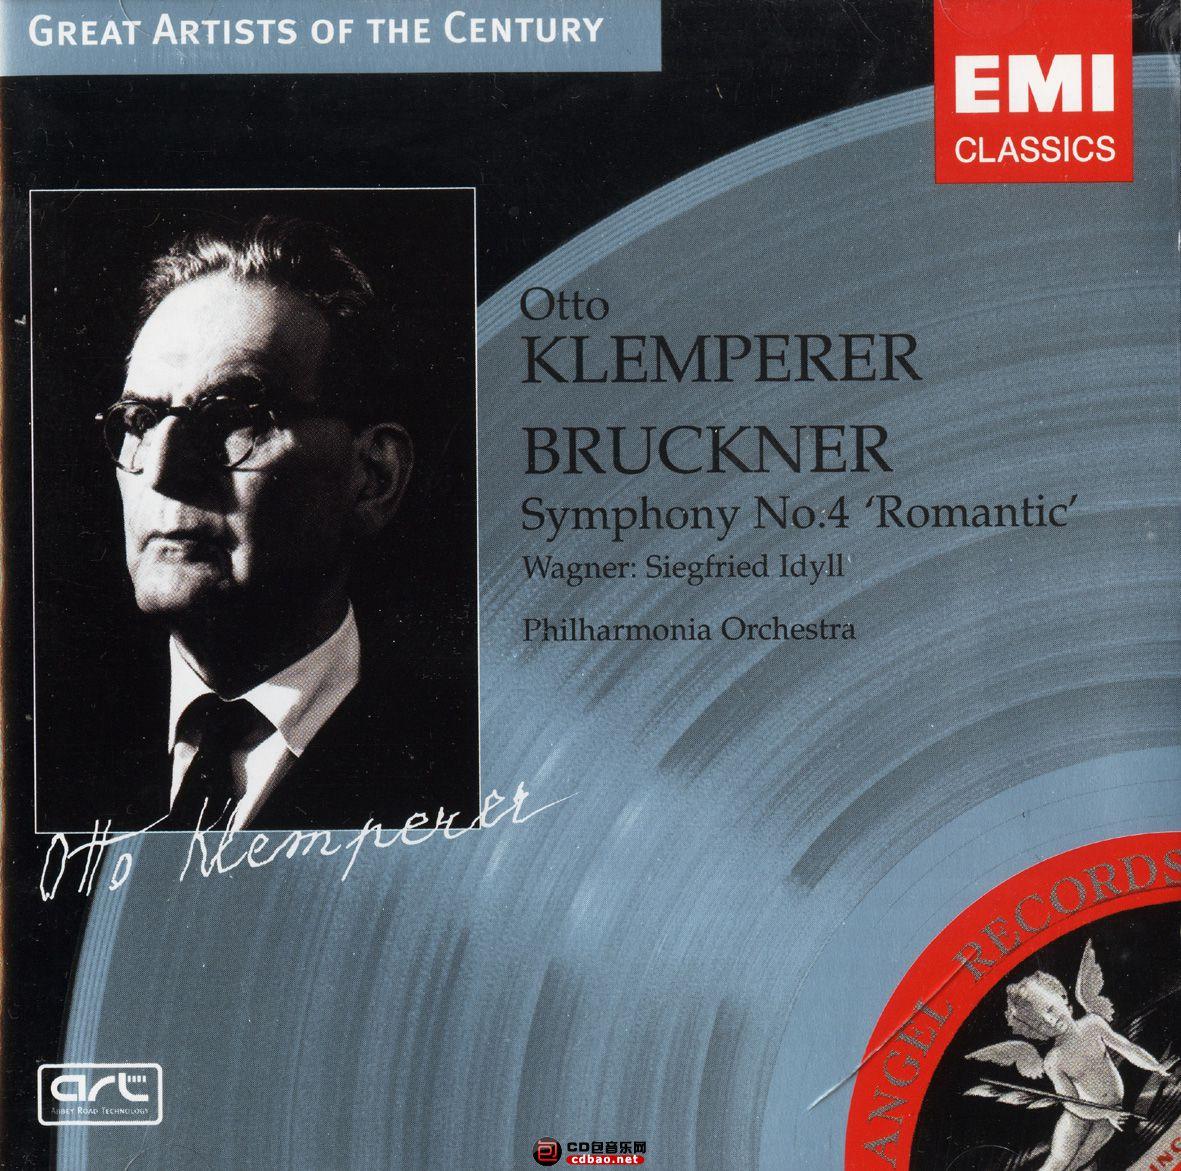 Klemperer_Bruckner Sym No.4 & Wagner Siegfried Idyll.01.jpg